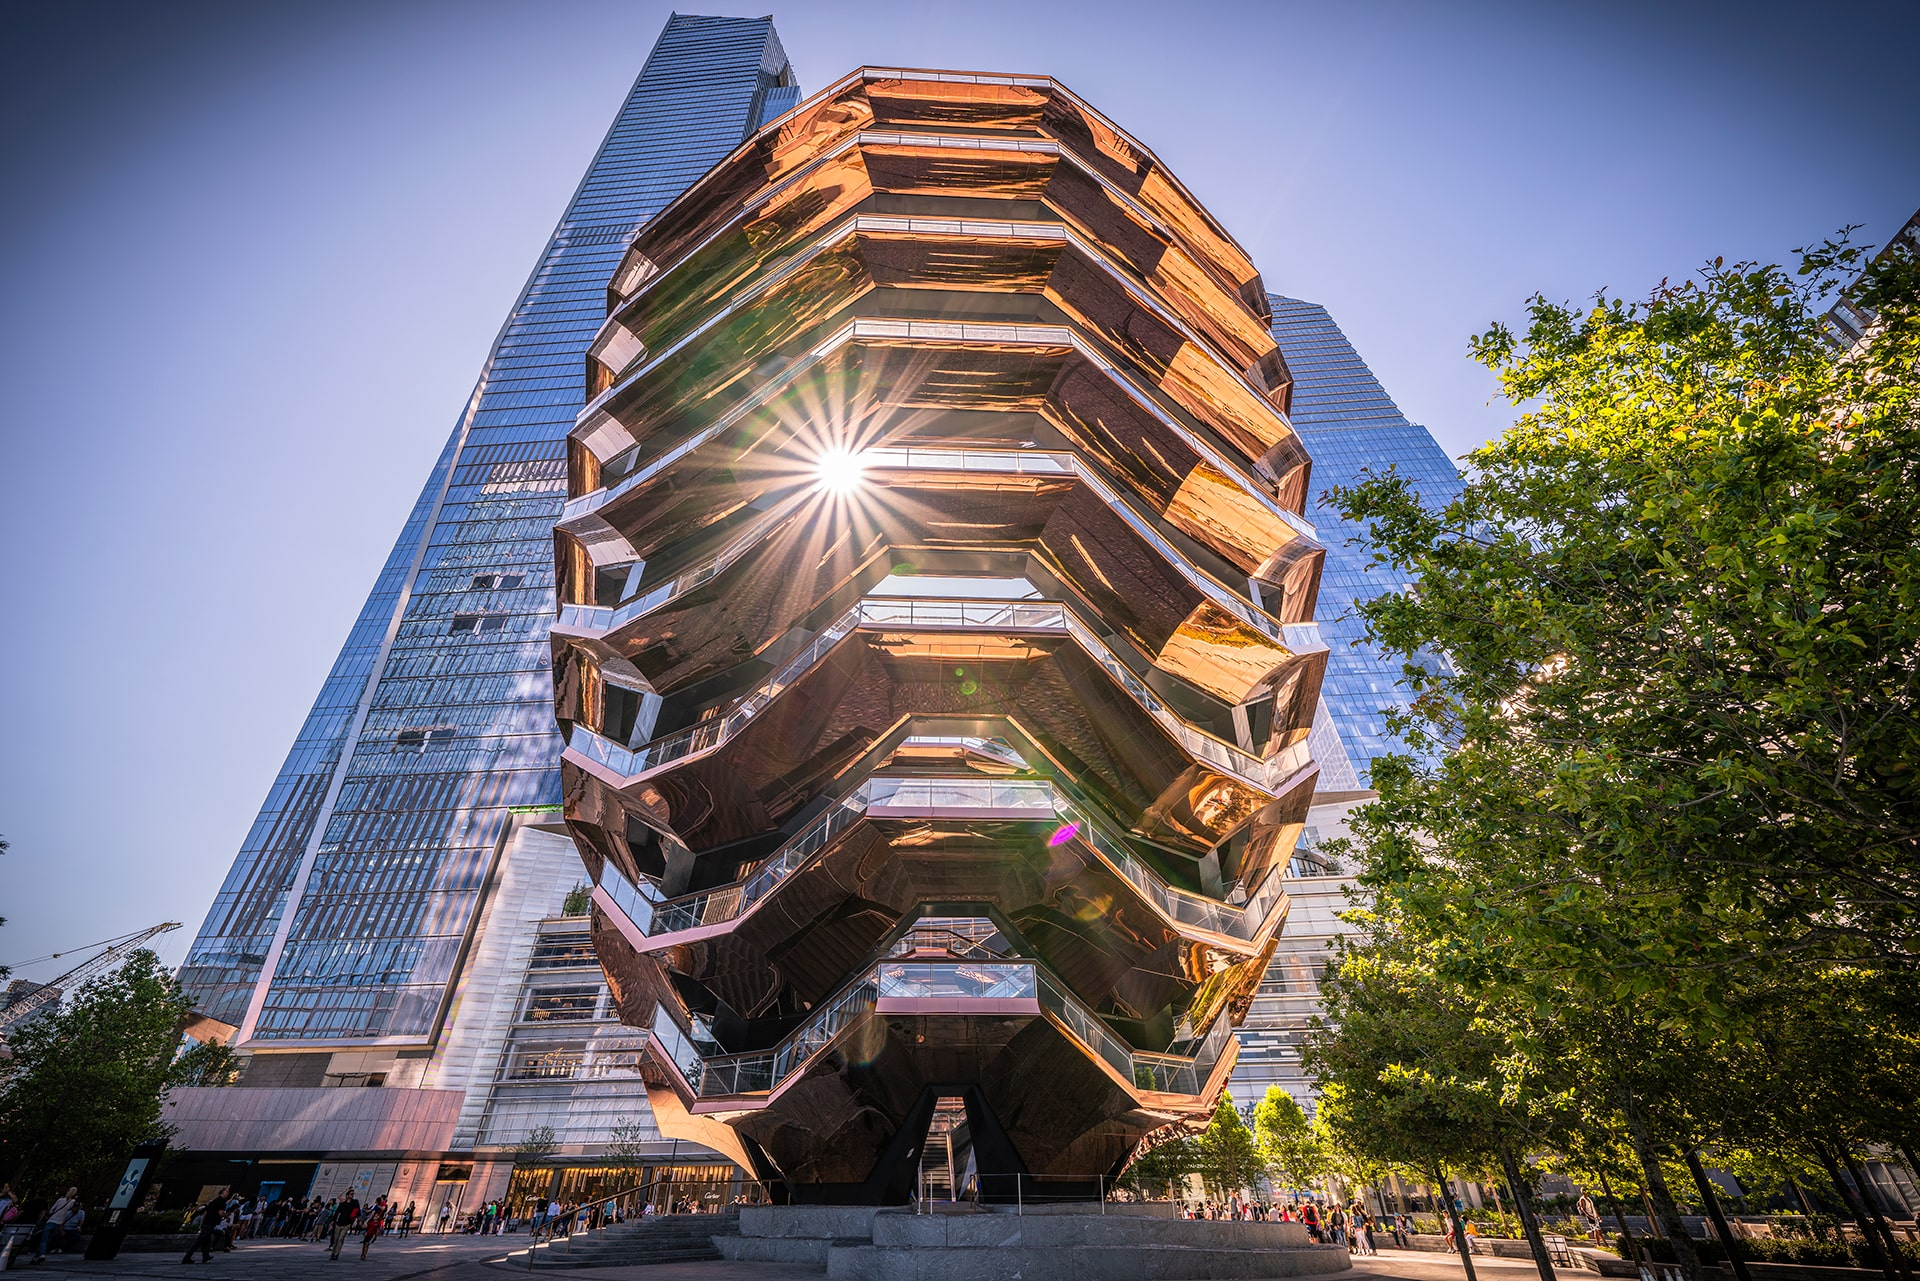 Blog Lifestyle - Monument architectural, the Vessel, New York - Suivre sa Joie - Saskia Parein